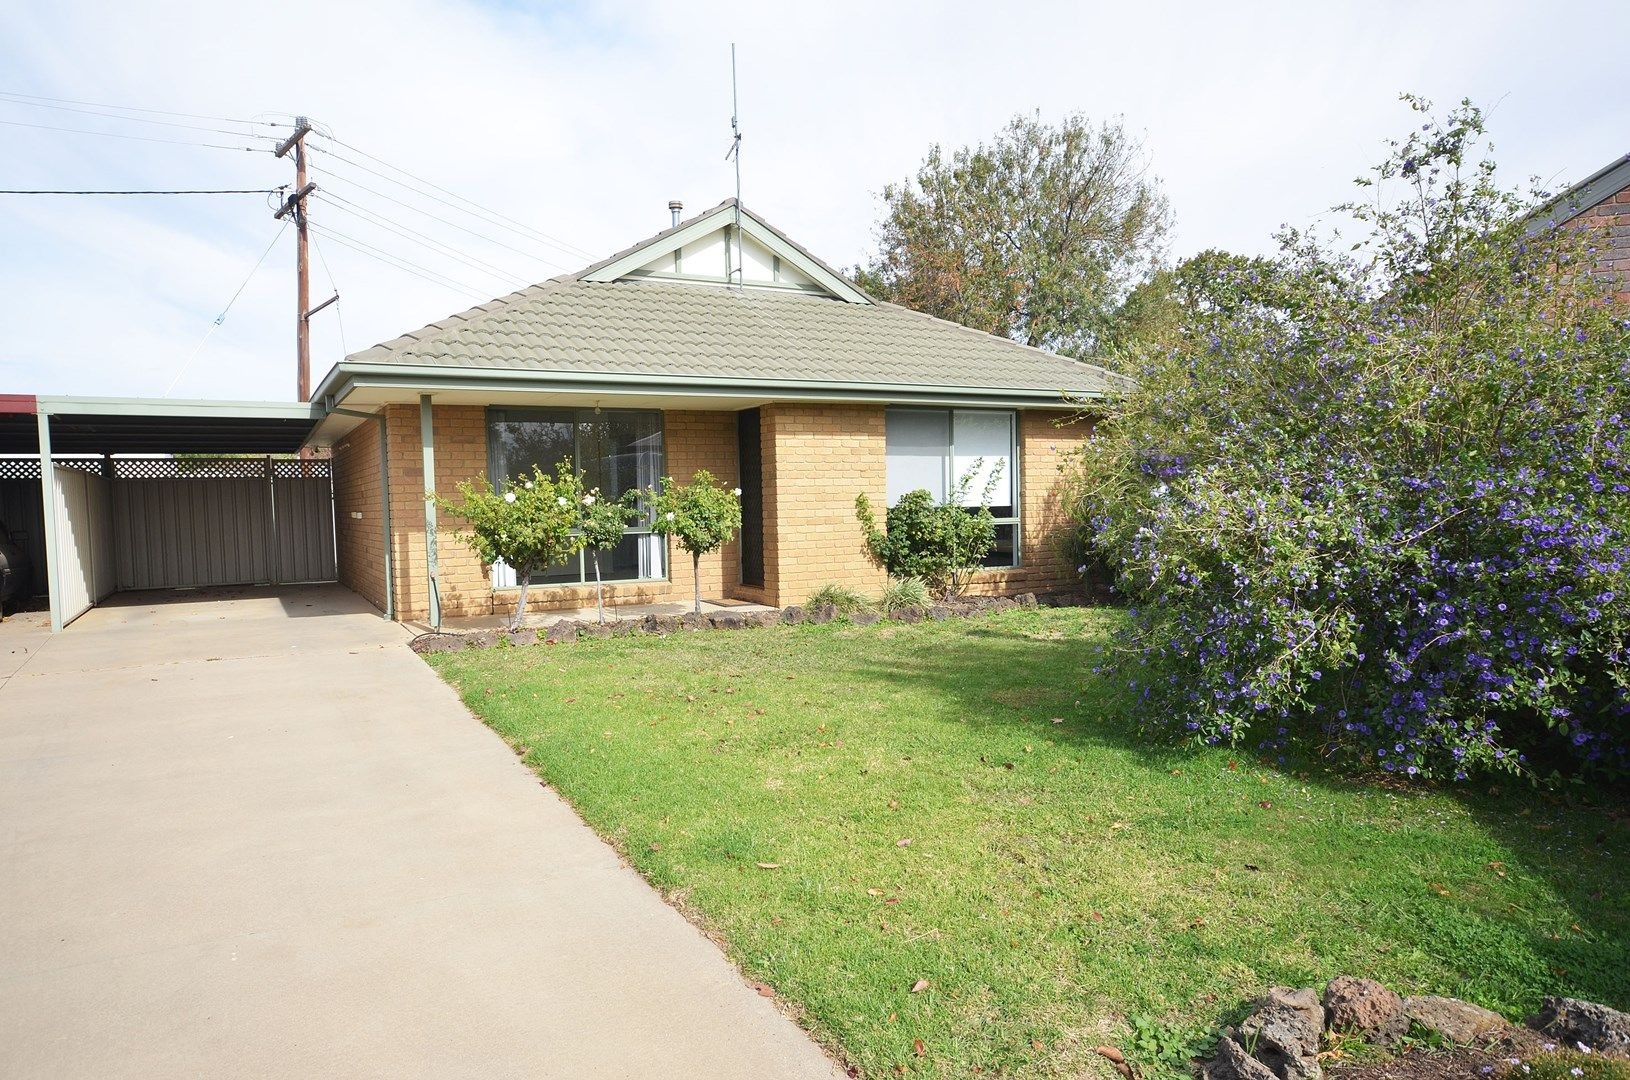 2/16 McLaren Drive, Moama NSW 2731, Image 0